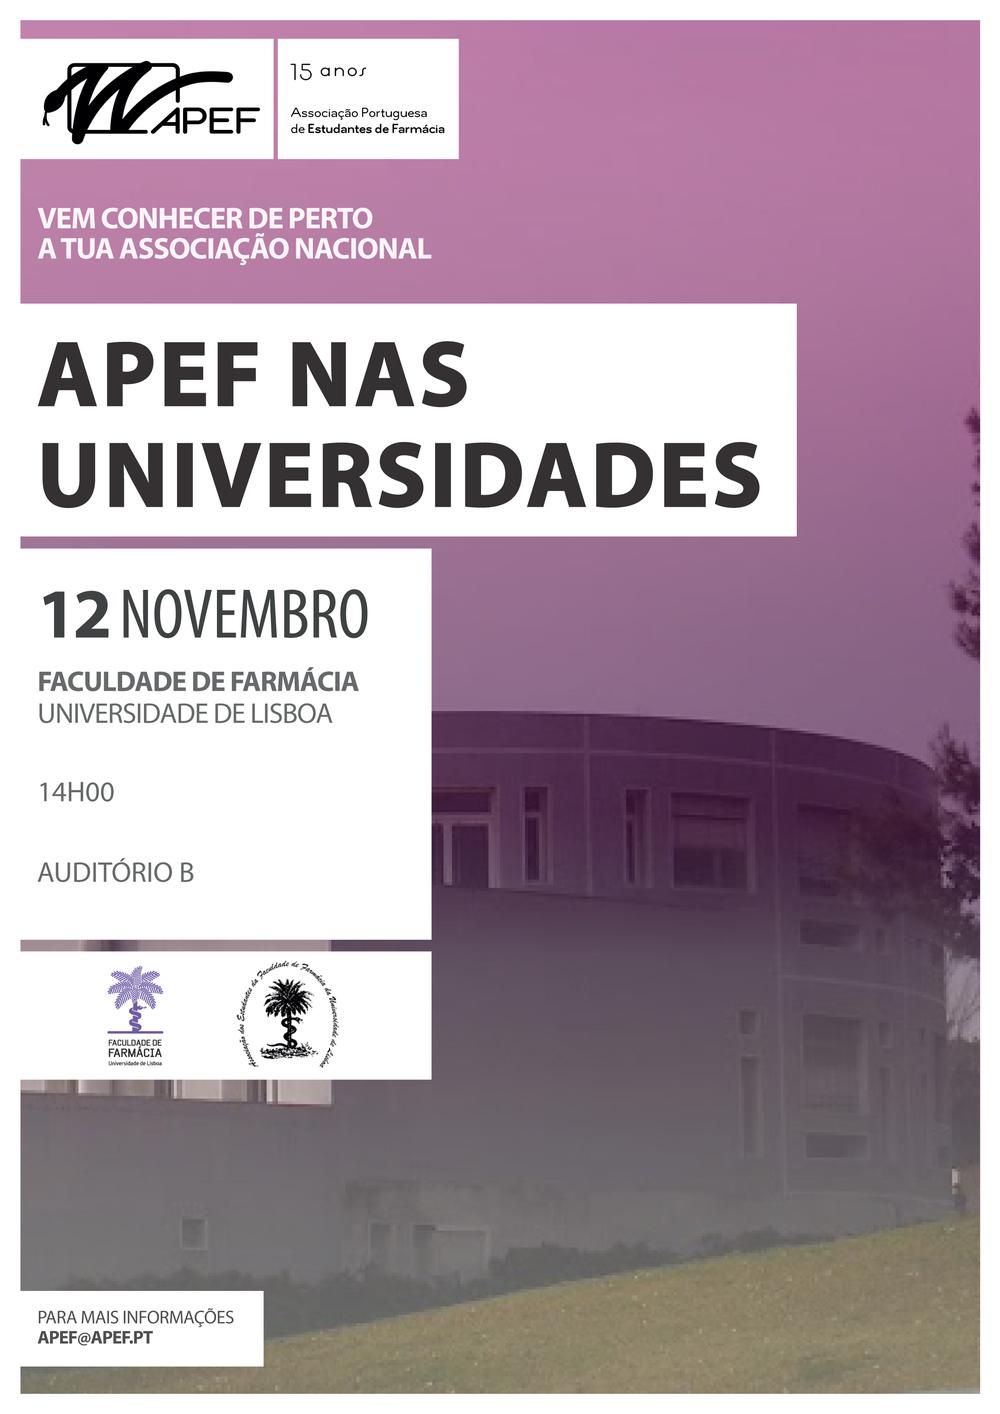 APEF nas Universidades - fful.jpg